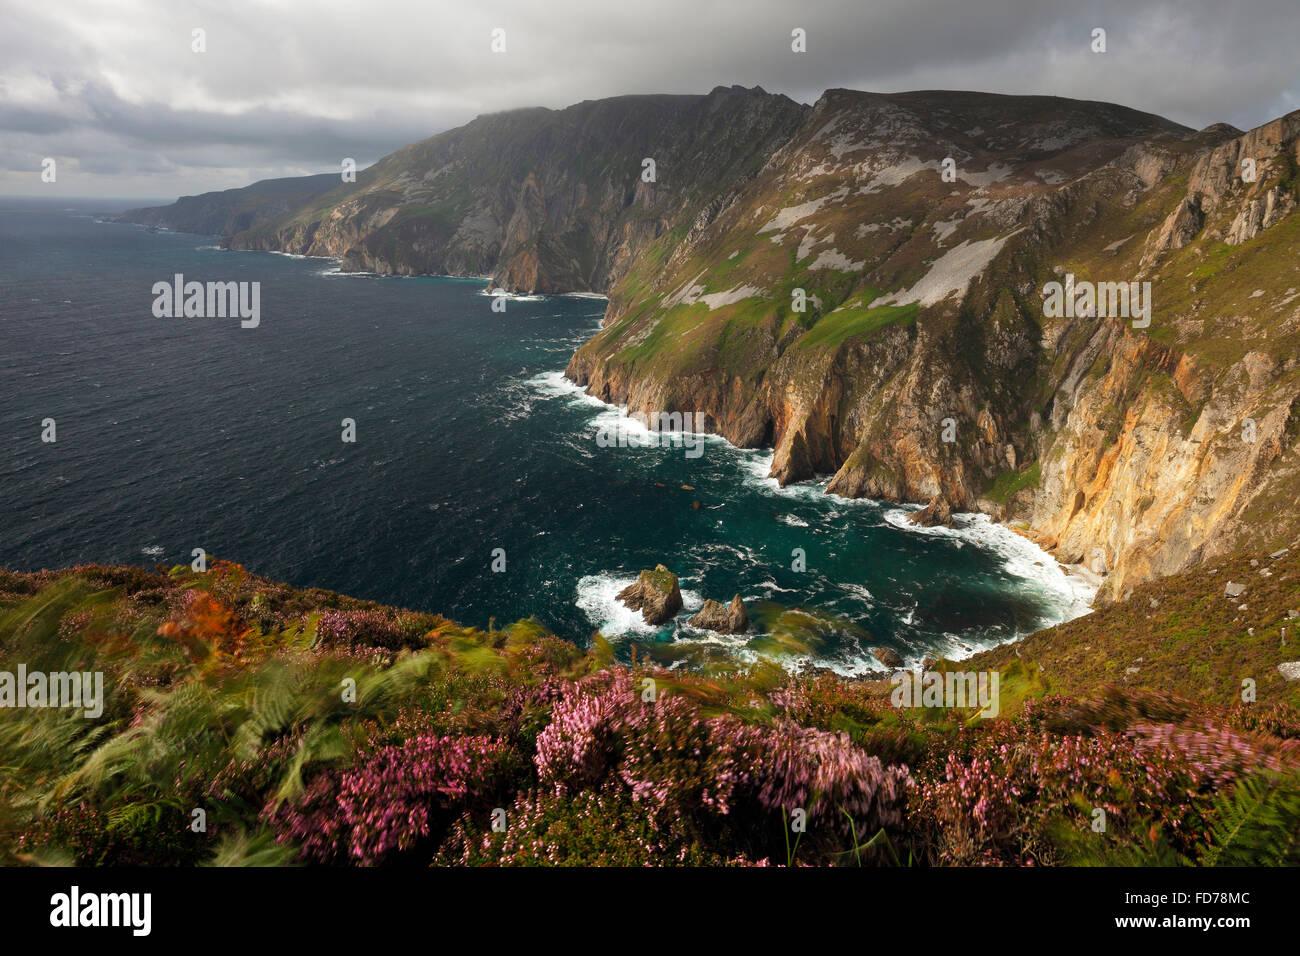 Slieve League (Irish: Sliabh Liag) - At 601 metres (1,972 ft), the highest sea cliffs in Ireland - Stock Image